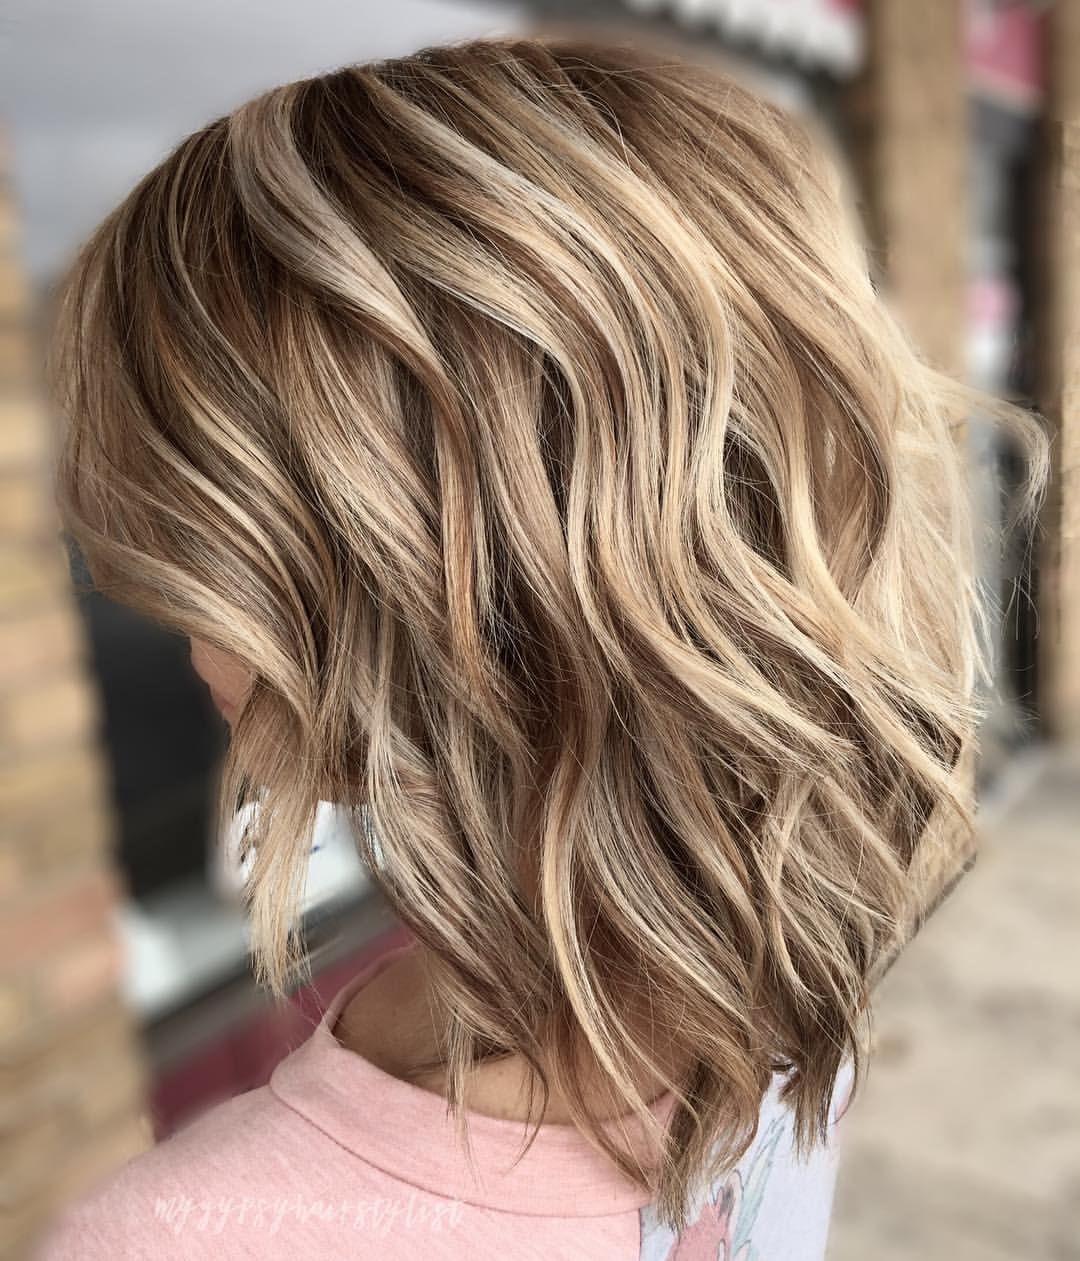 Buttered Blonde Dimensional Blonde Balayage Medium Length Hair Styles Blonde Highlights Short Hair Highlights Medium Length Hair Styles Medium Hair Styles